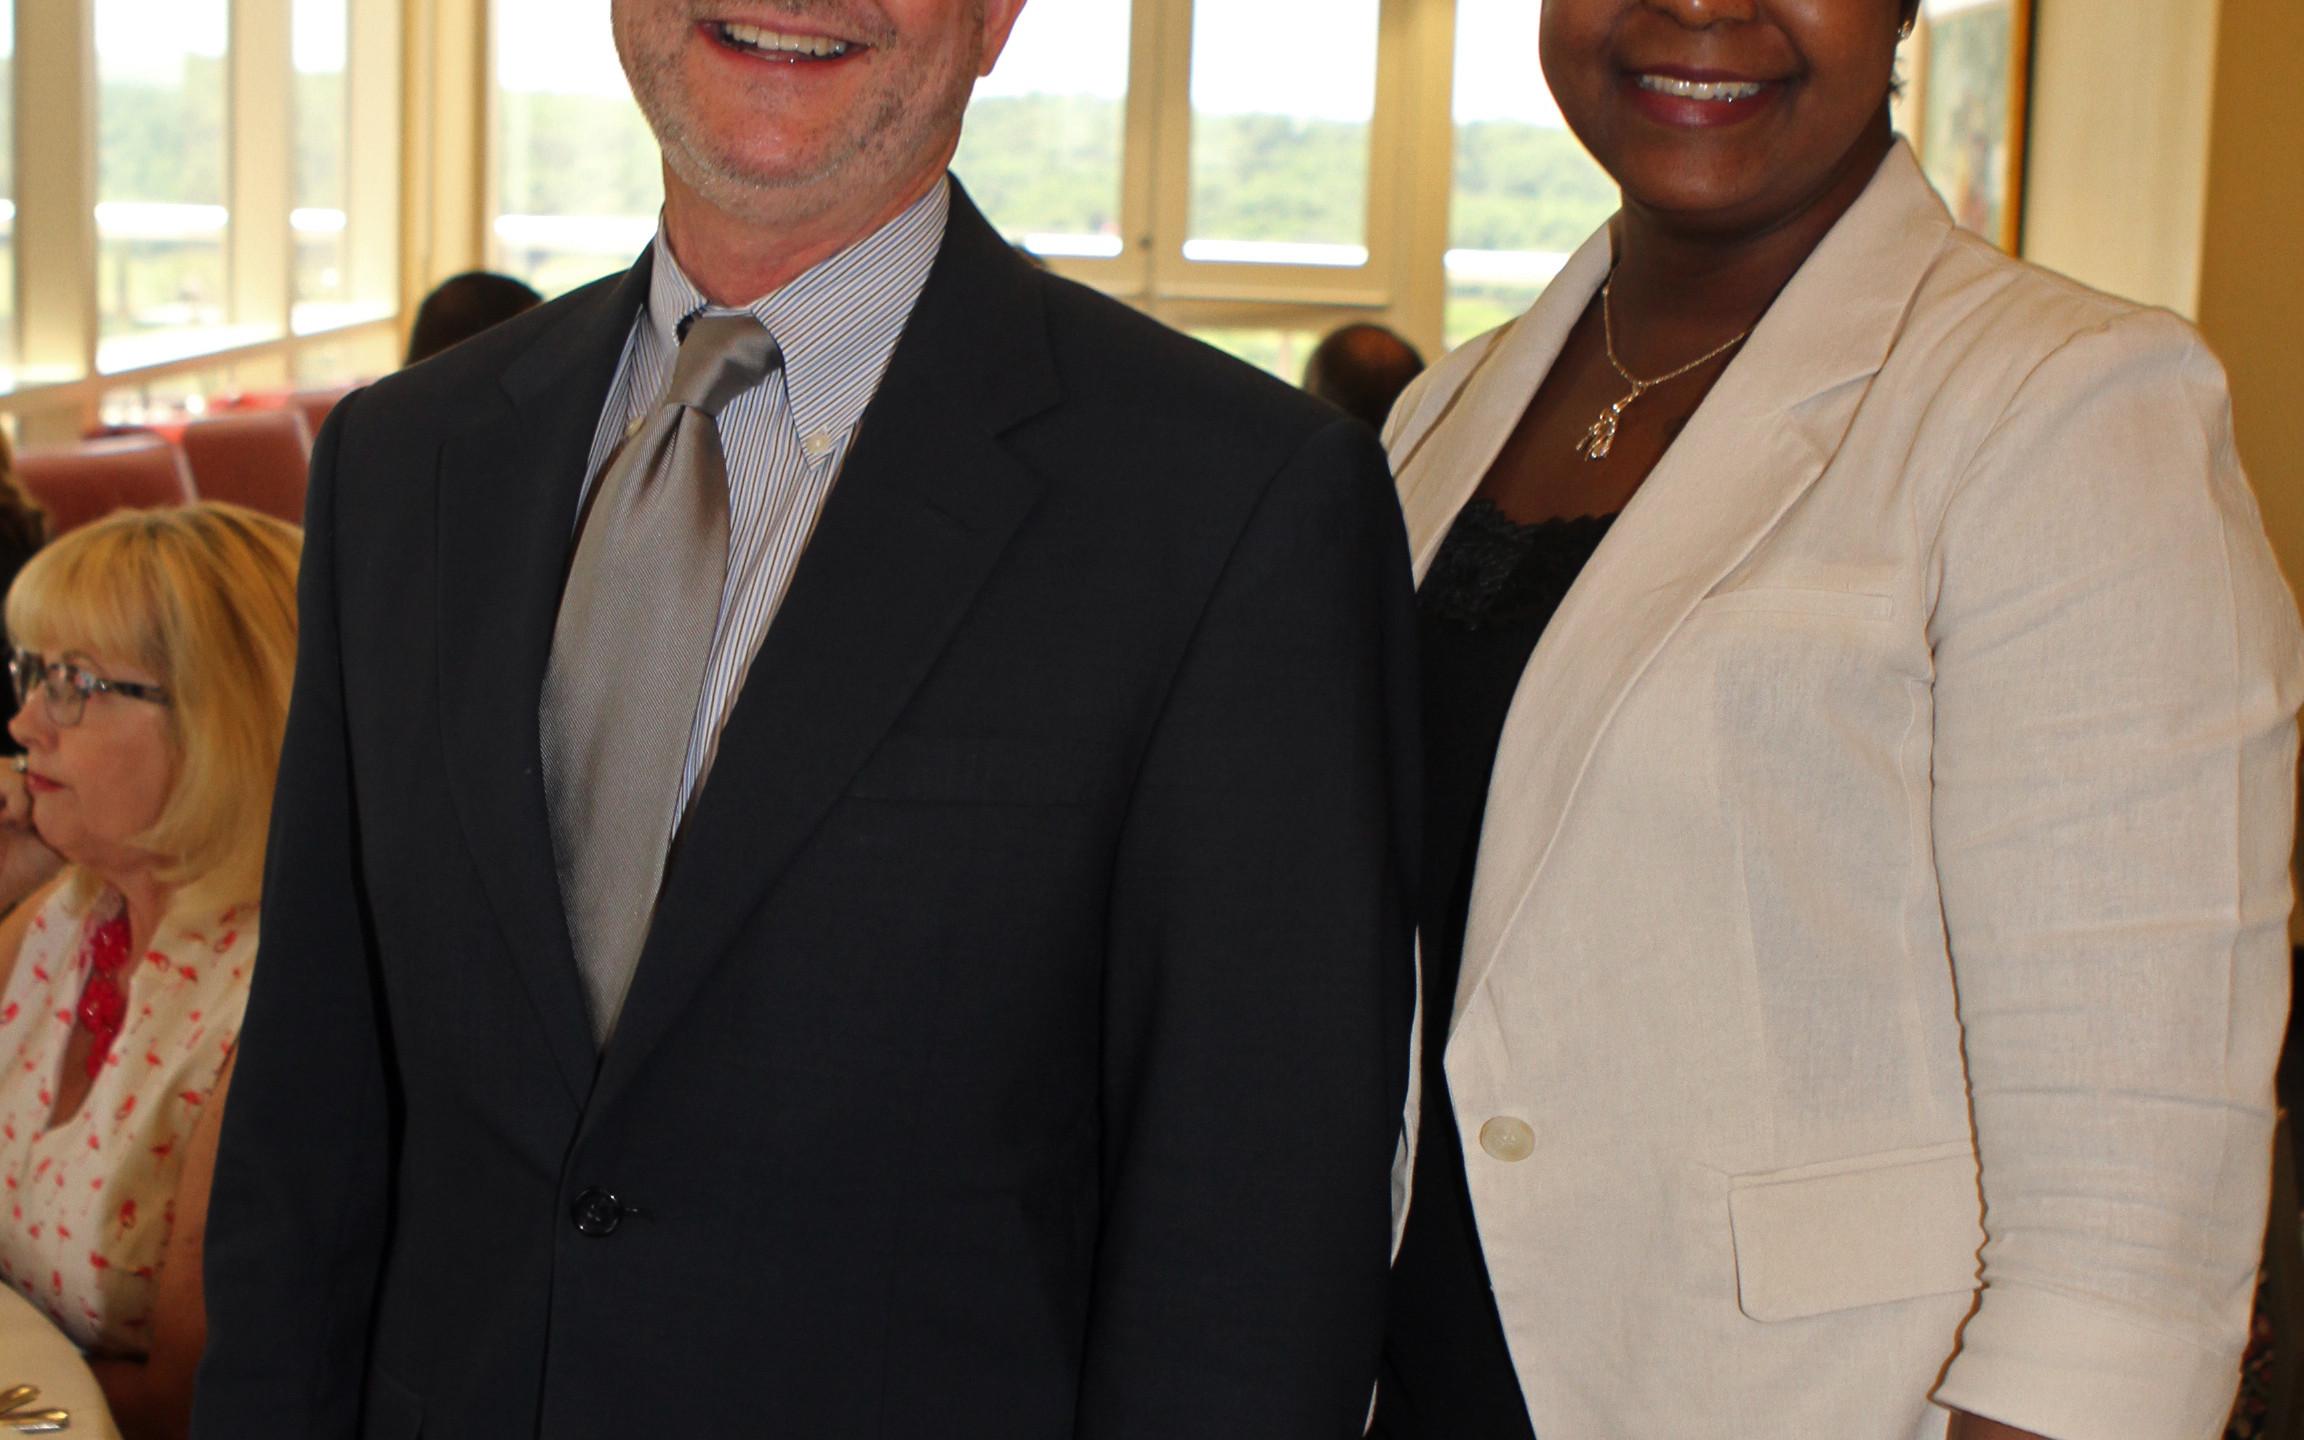 Judge Tim Barnes, Ericka O'Neal